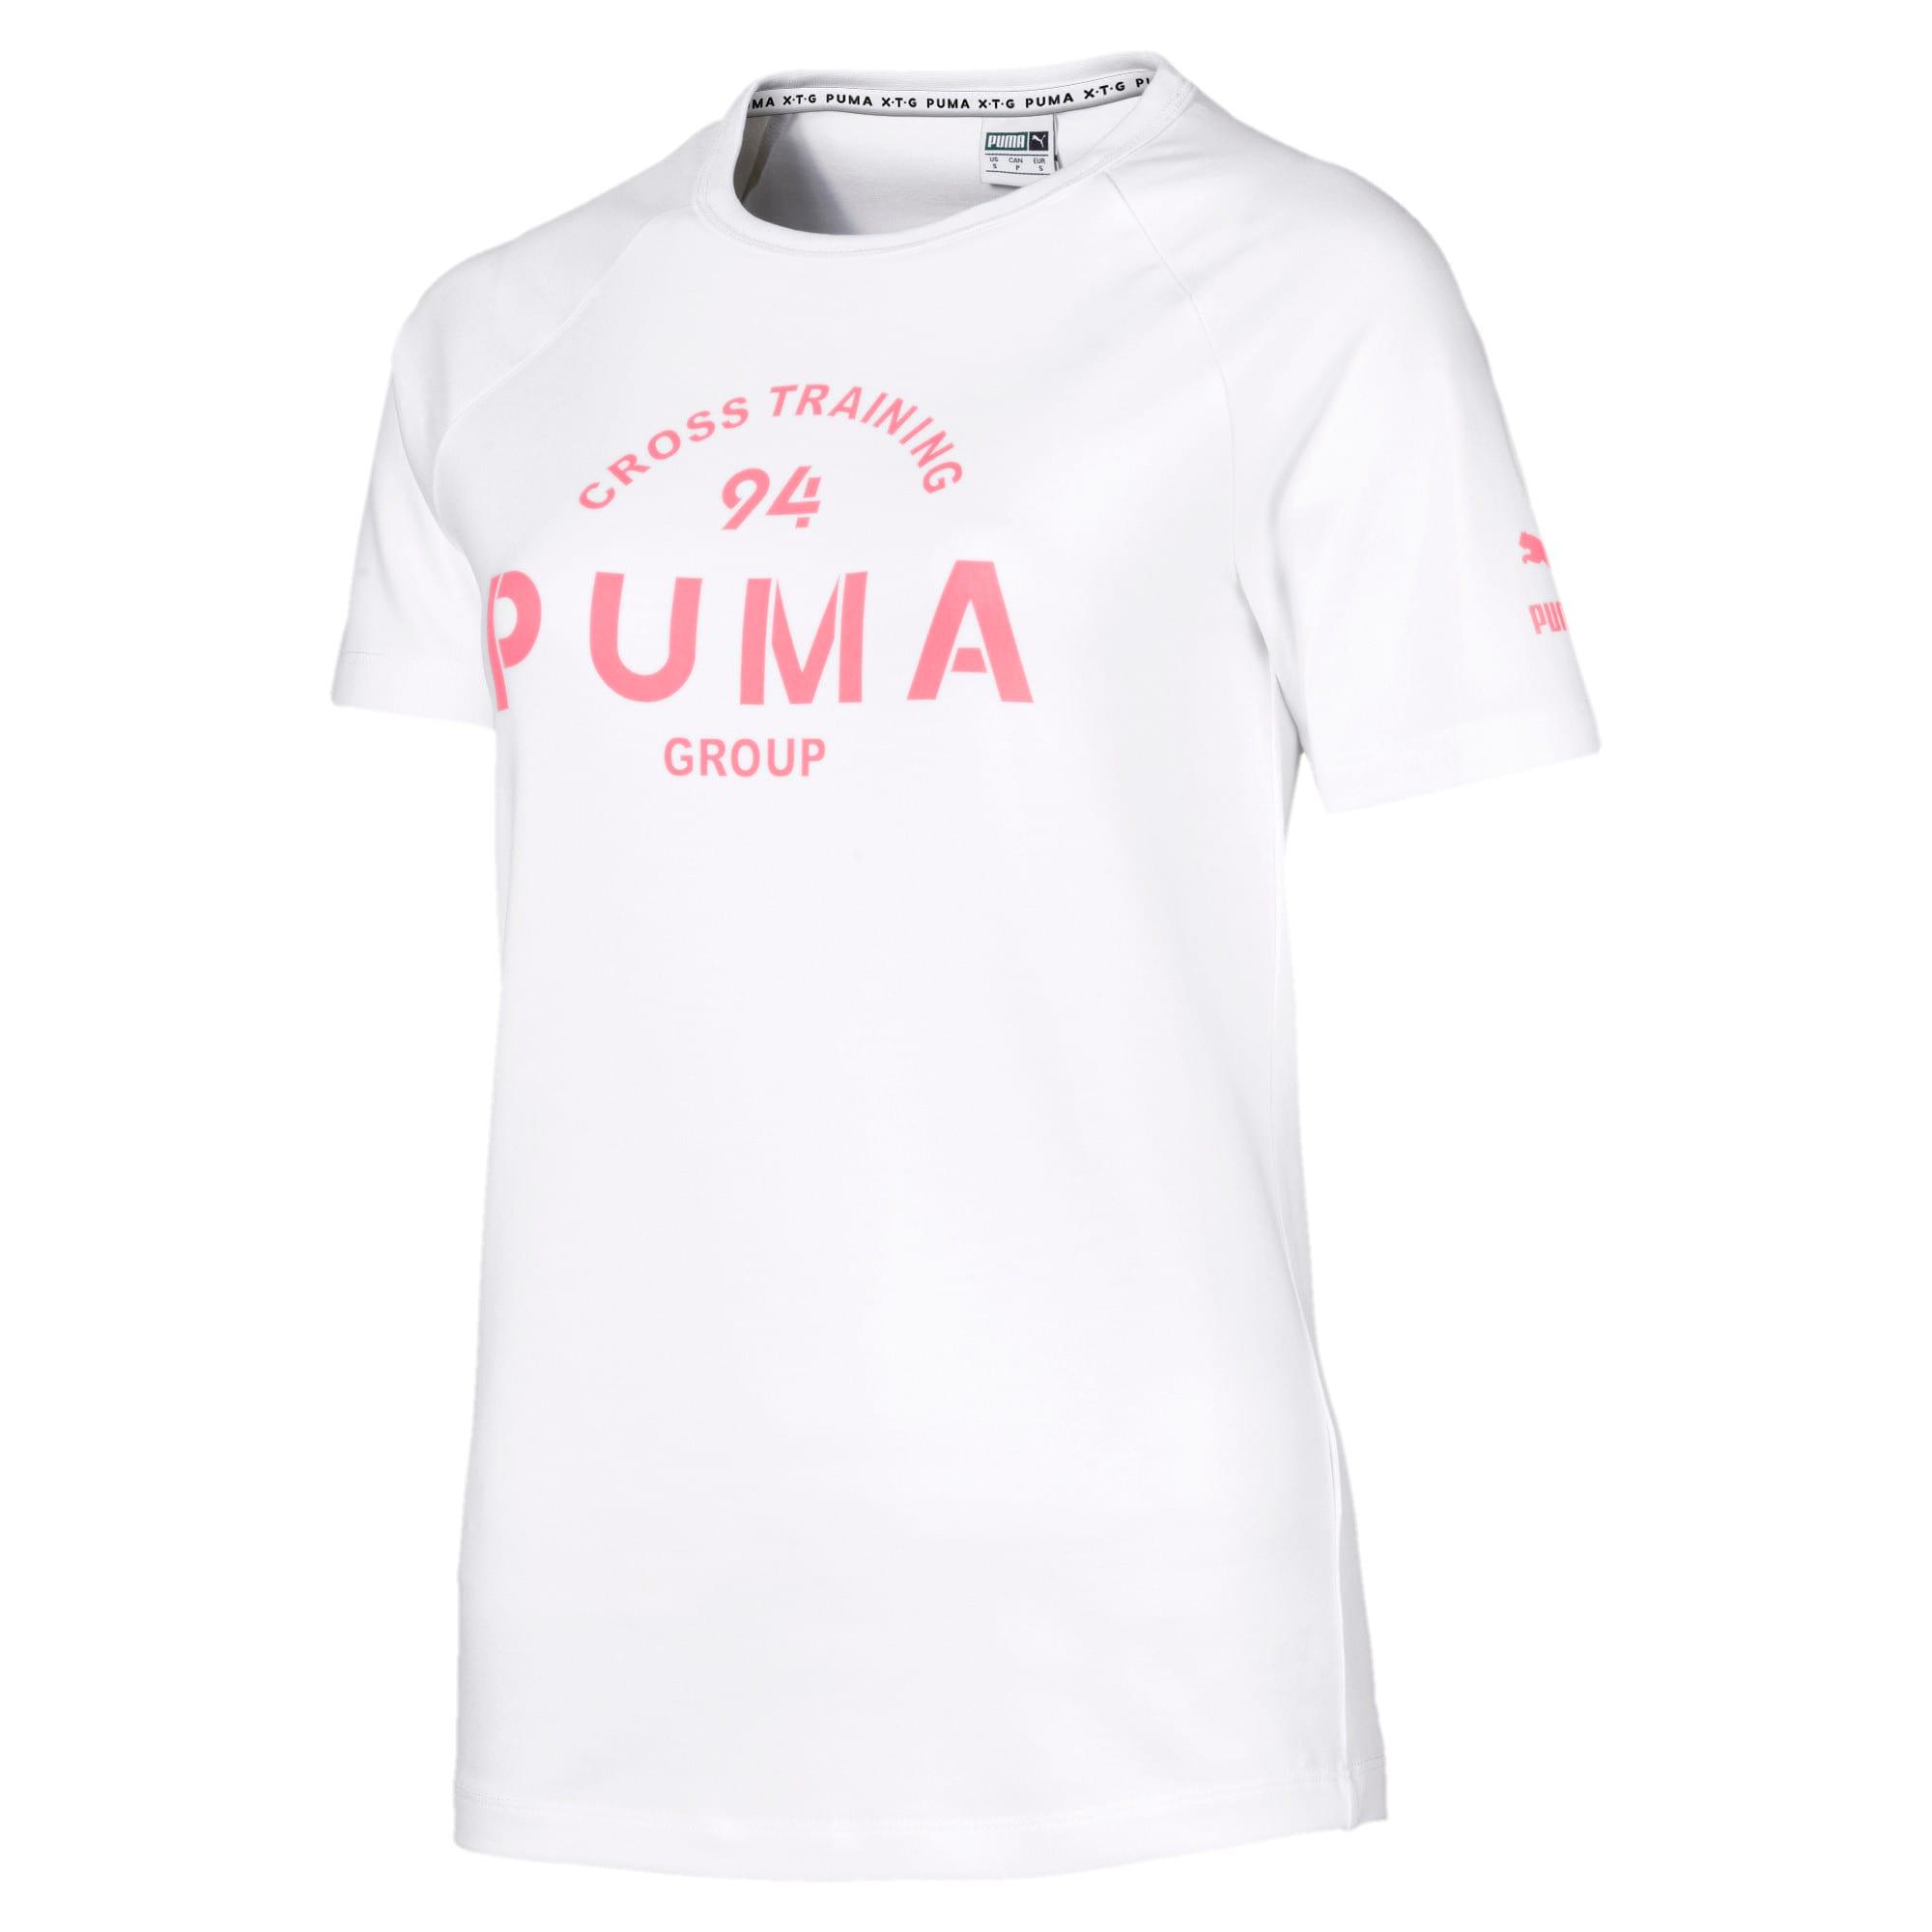 Thumbnail 4 of PUMA XTG Women's Graphic Top, Puma White, medium